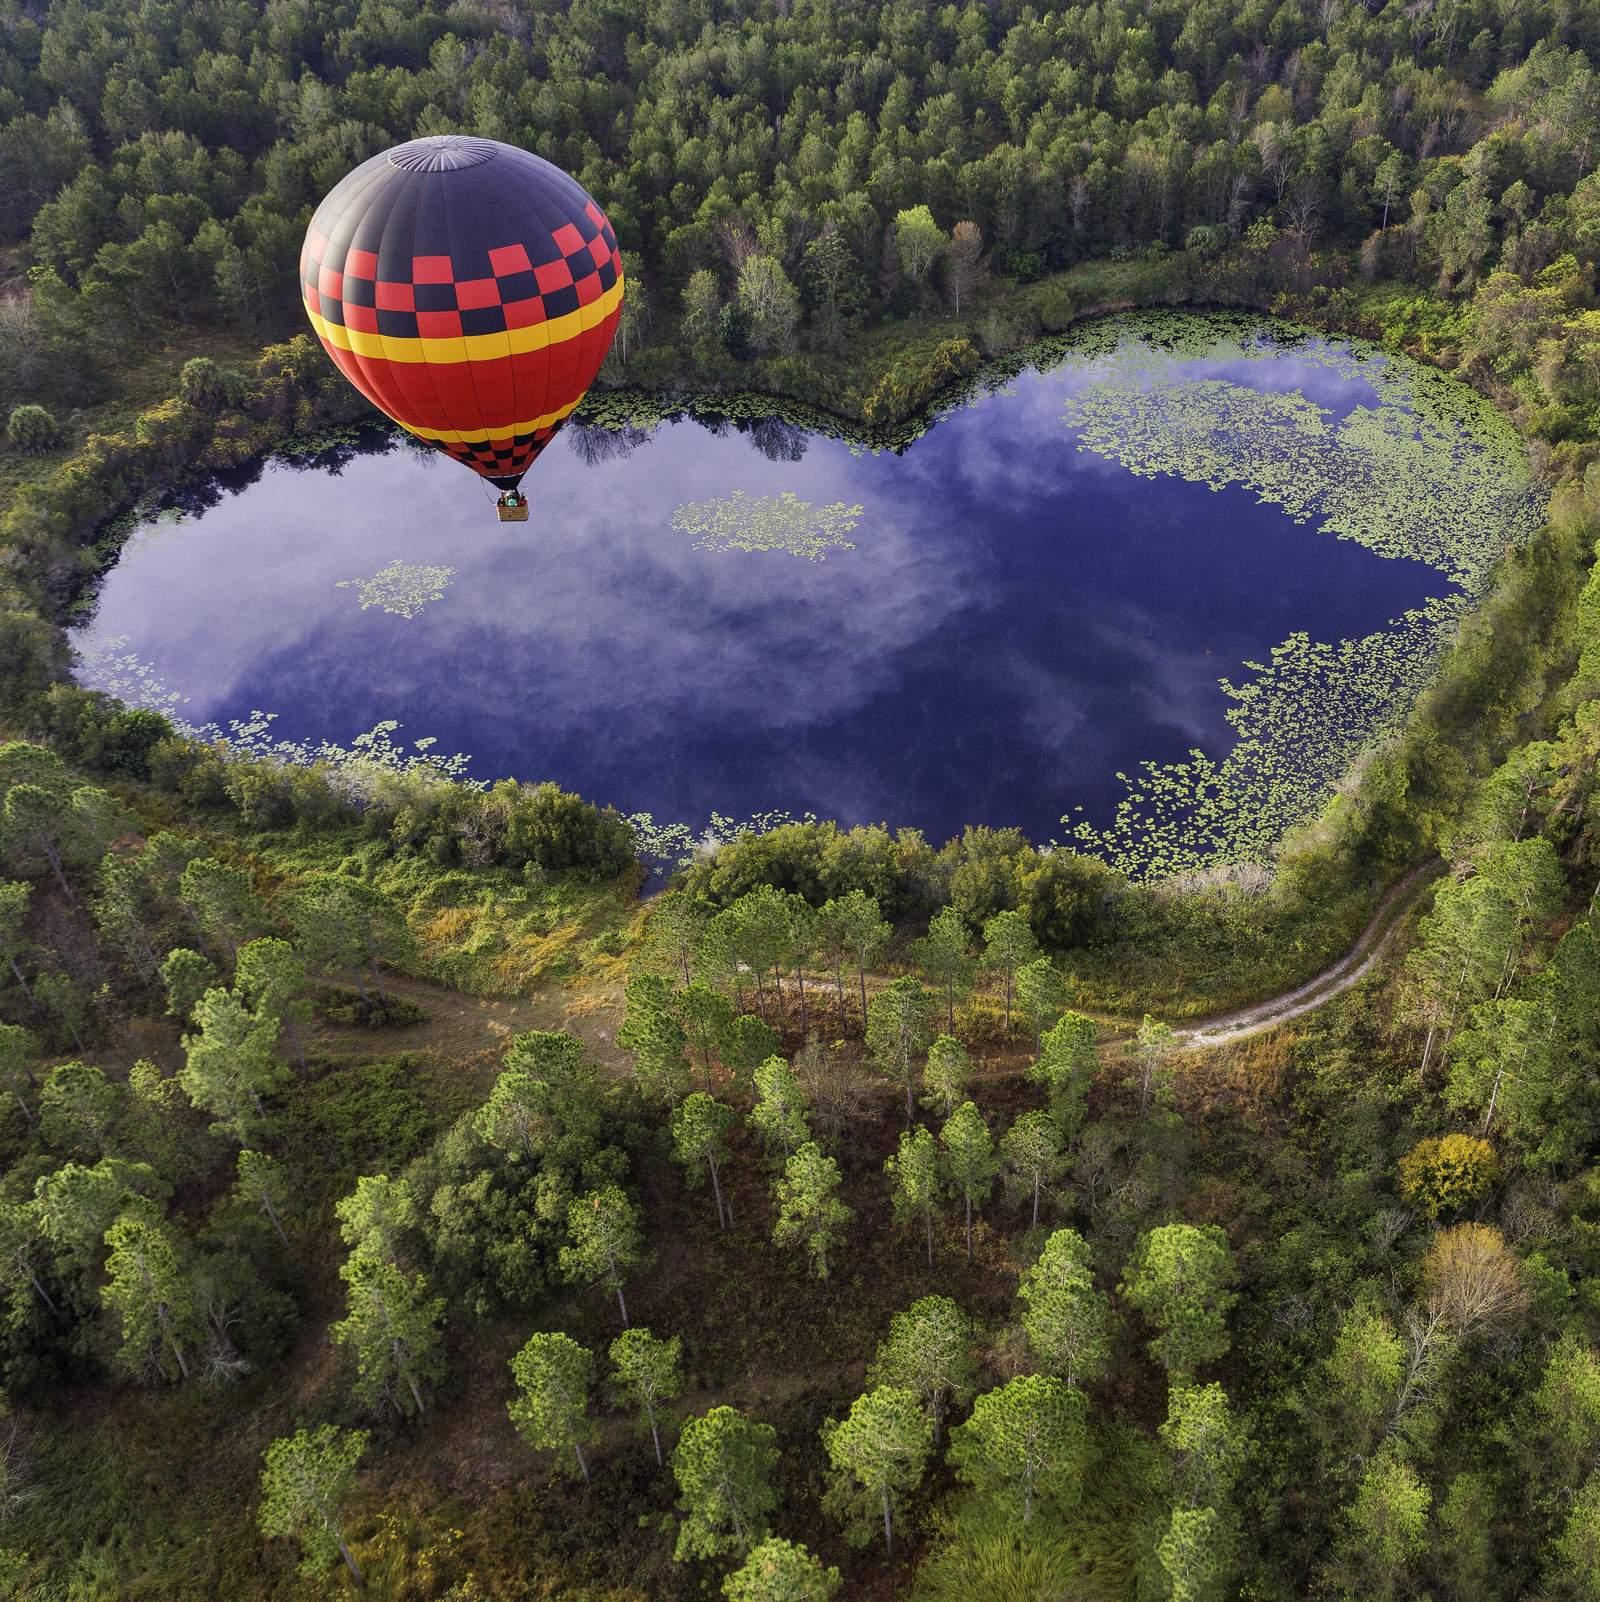 Mit dem Heißluftballon über Davenport in Orlando